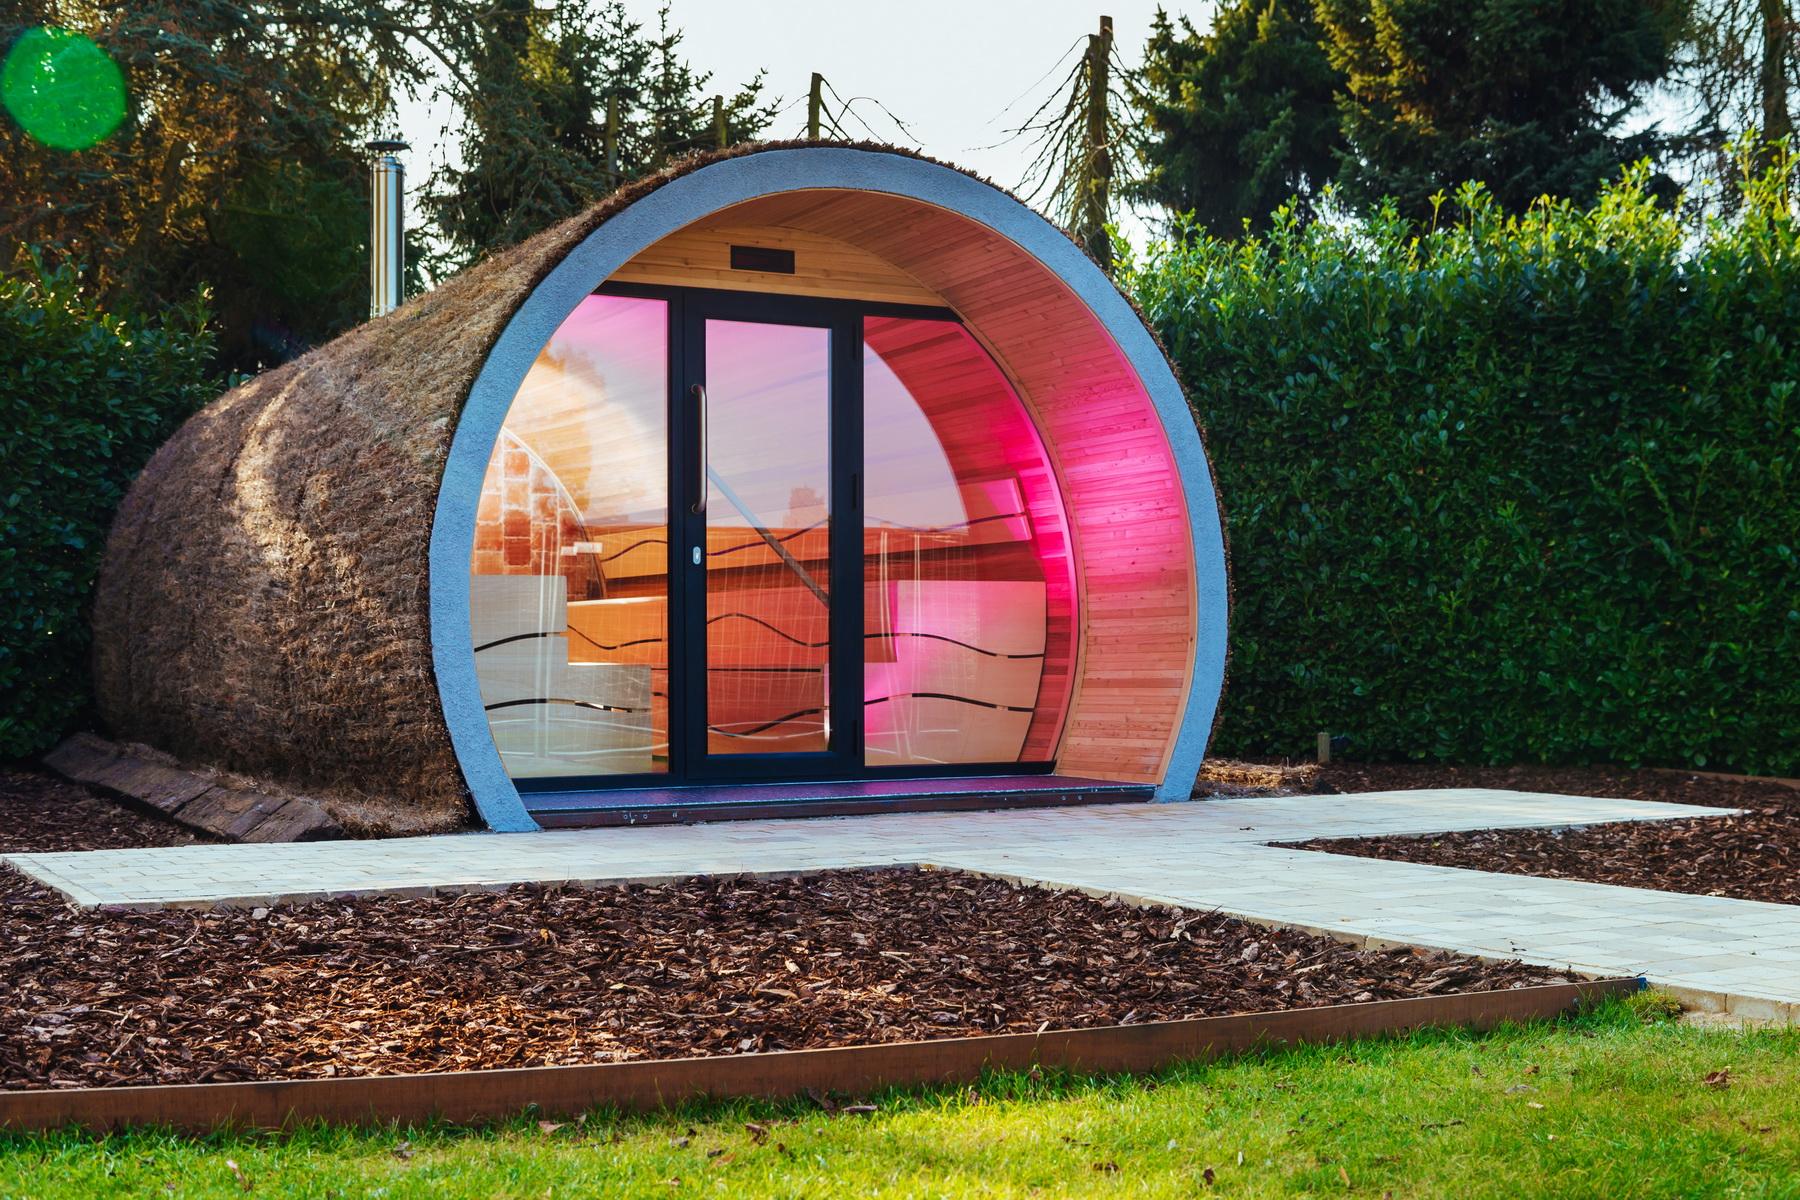 sauna sahara combi la tradition du po le la modernit de l 39 infrarouge piscine et jardin. Black Bedroom Furniture Sets. Home Design Ideas